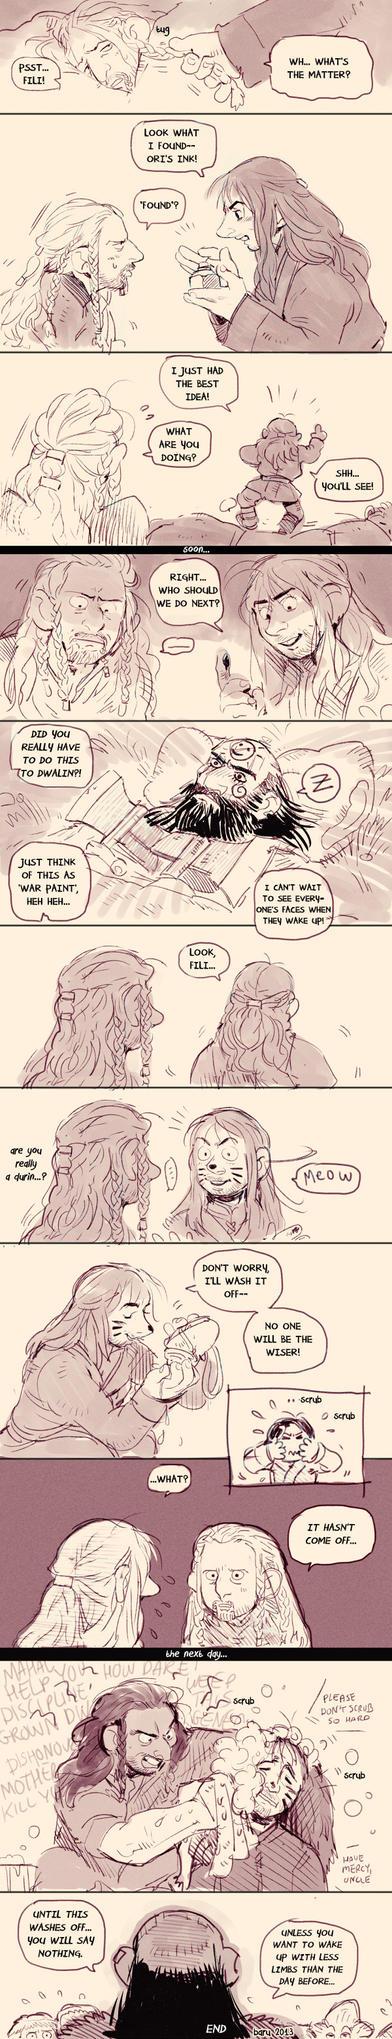 Hobbit fancomic - Ink by Barukurii